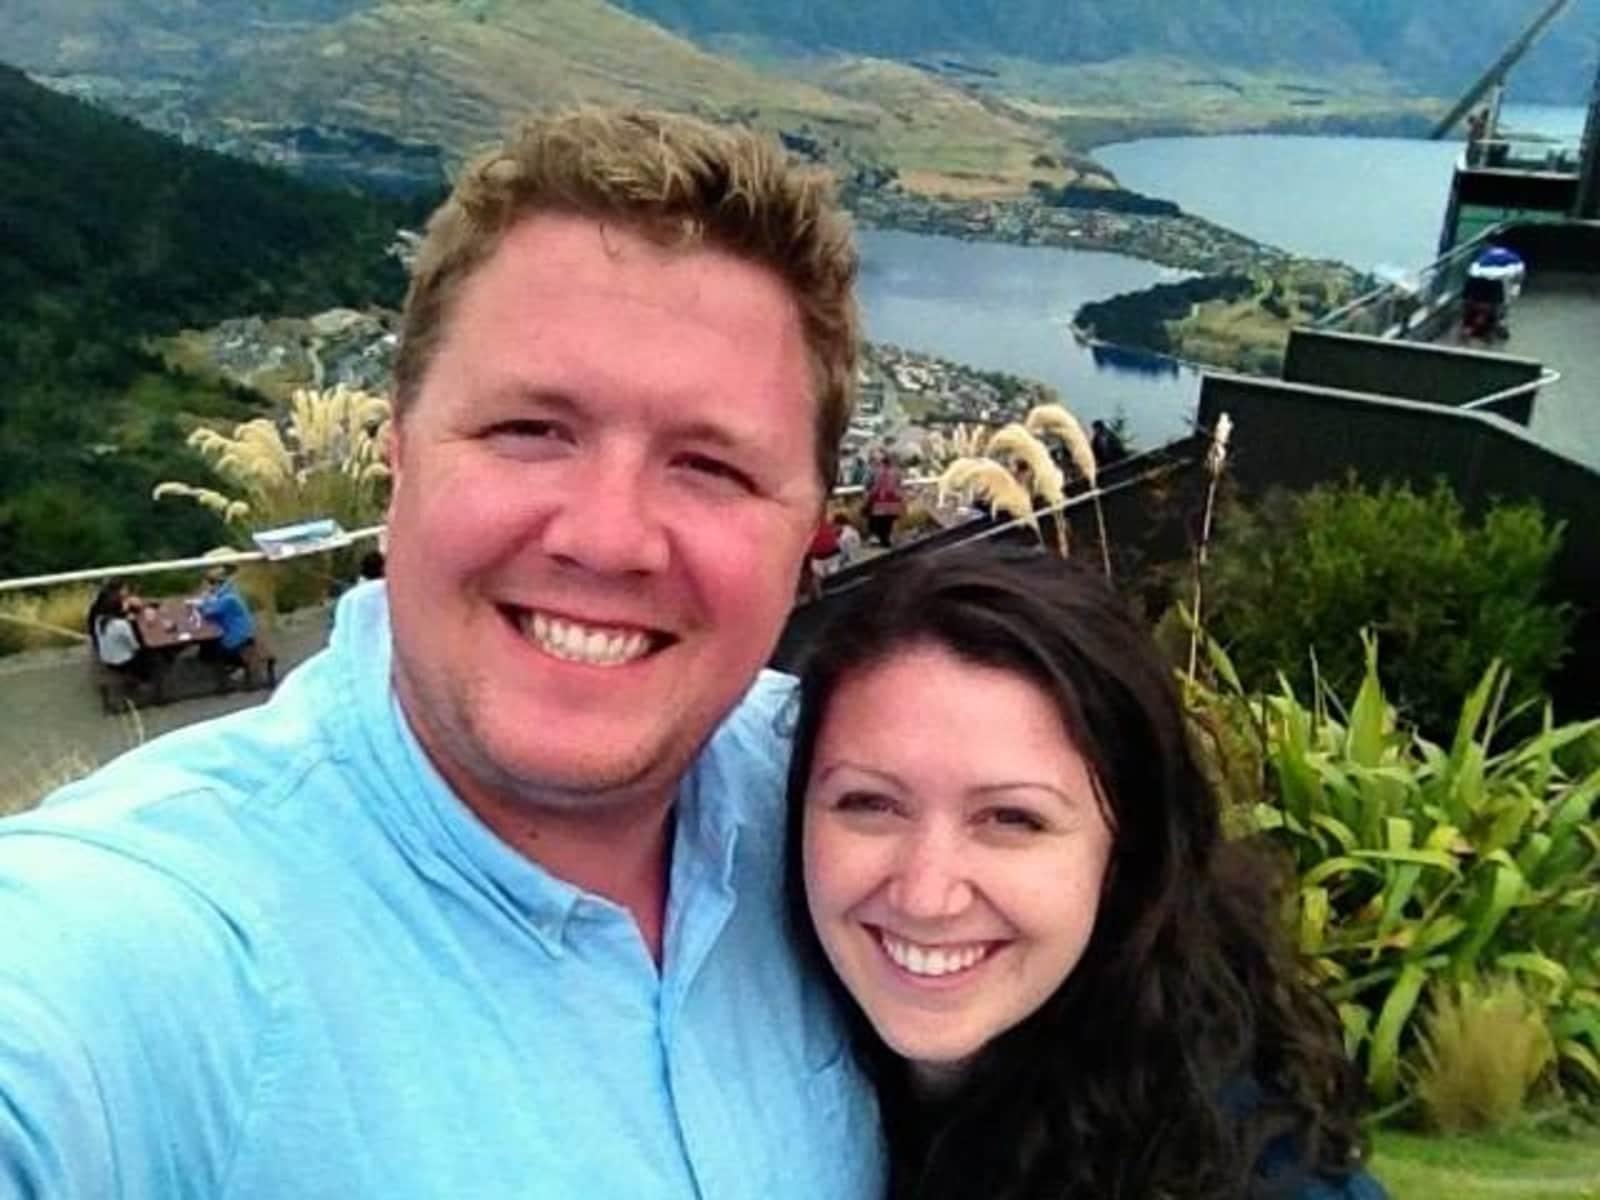 Danielle & Brydon from Ottawa, Ontario, Canada